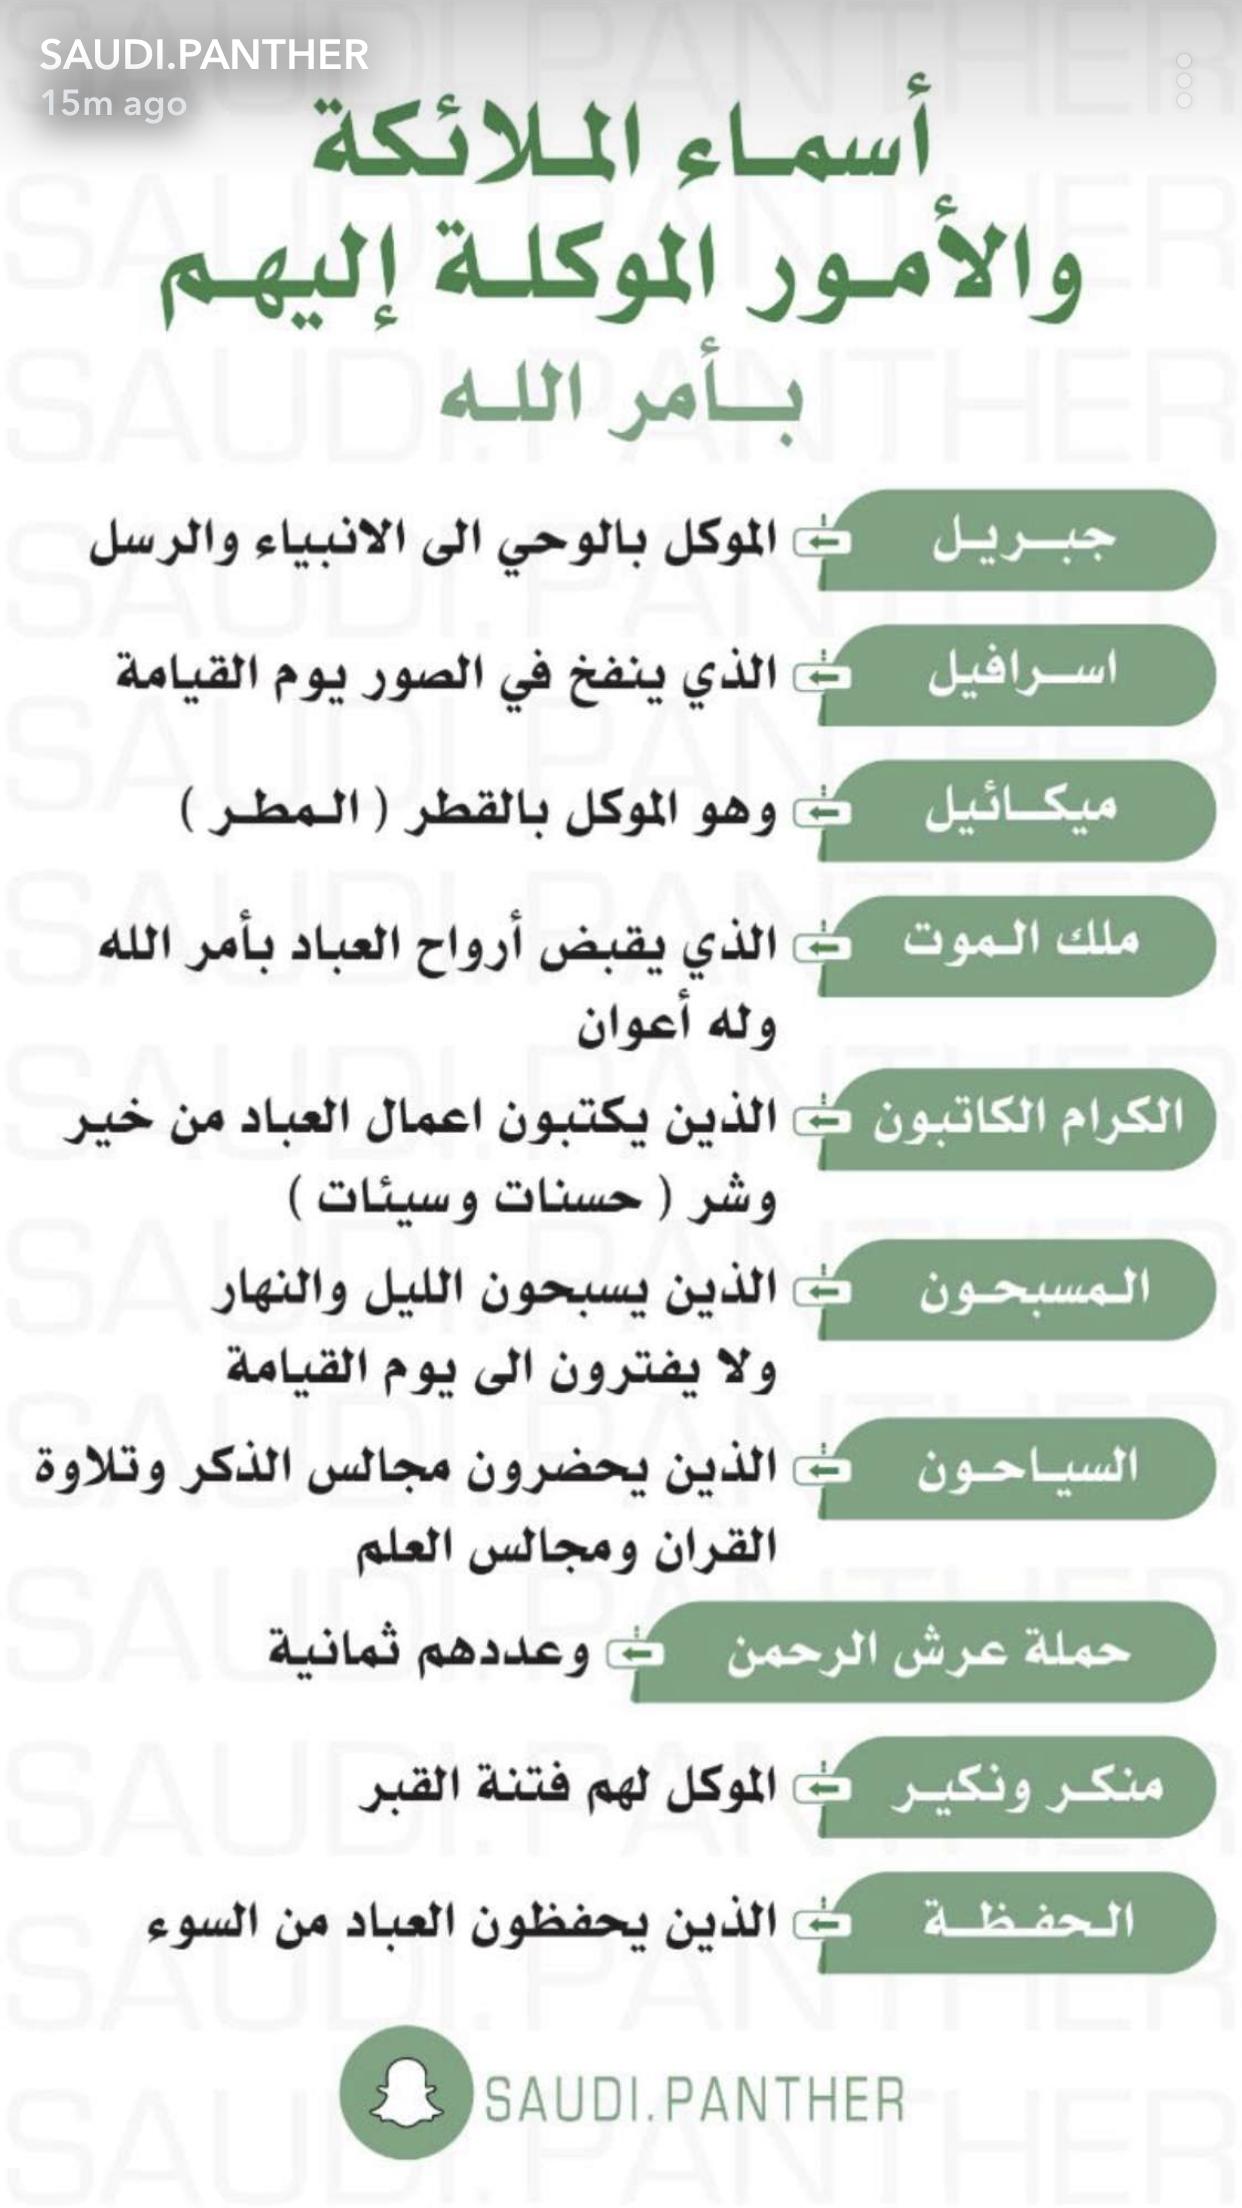 أسماء الملائكة Islam Beliefs Islam Facts Learn Islam